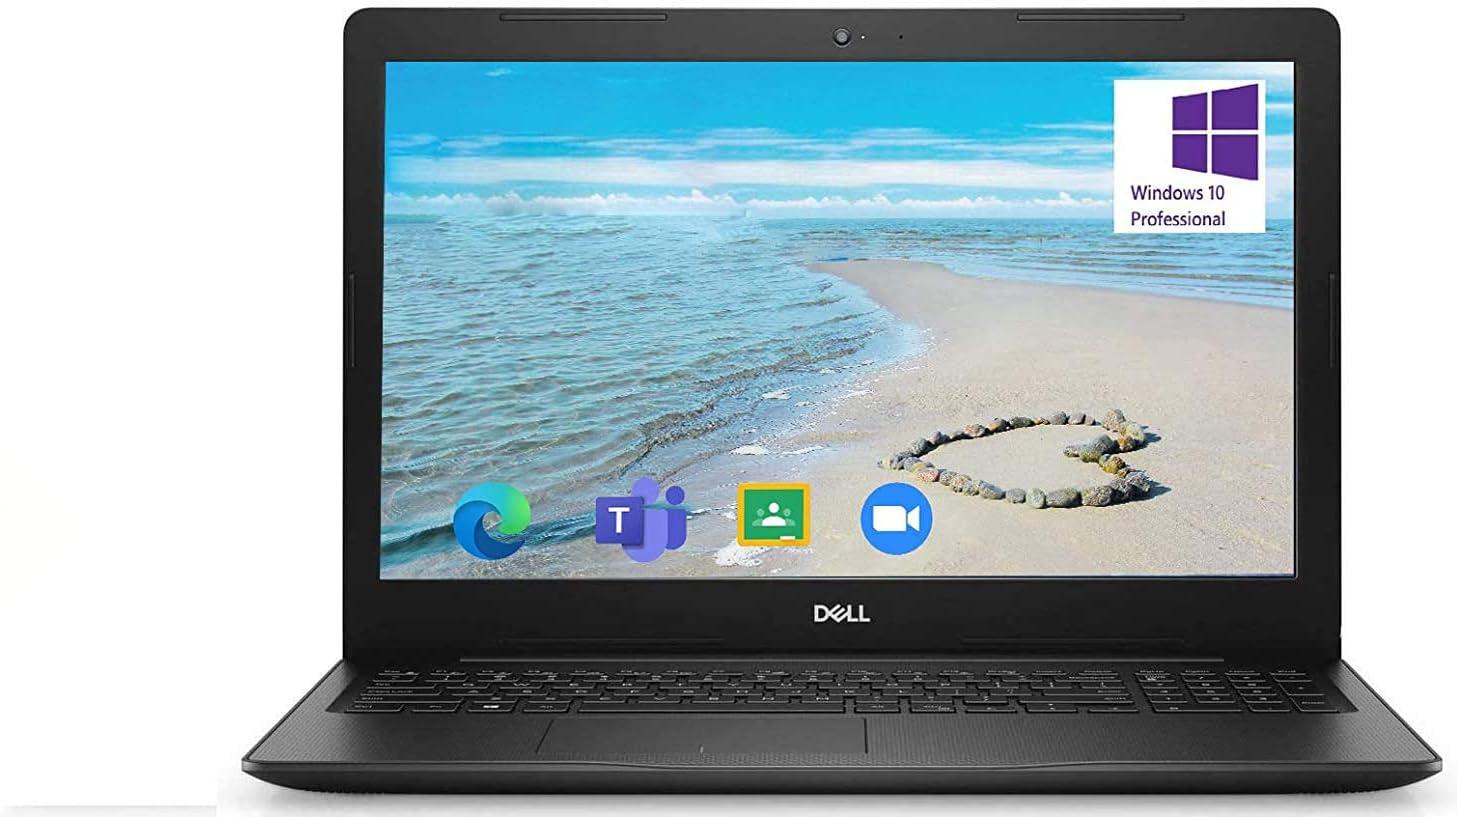 2020 Newest Dell Inspiron 15.6 inch Laptop, 10th Gen Intel Core i5-1035G1, 16GB RAM, 512GB SSD, HDMI, WiFi, Intel UHD Graphics, Bluetooth, Online Class Win 10 Pro